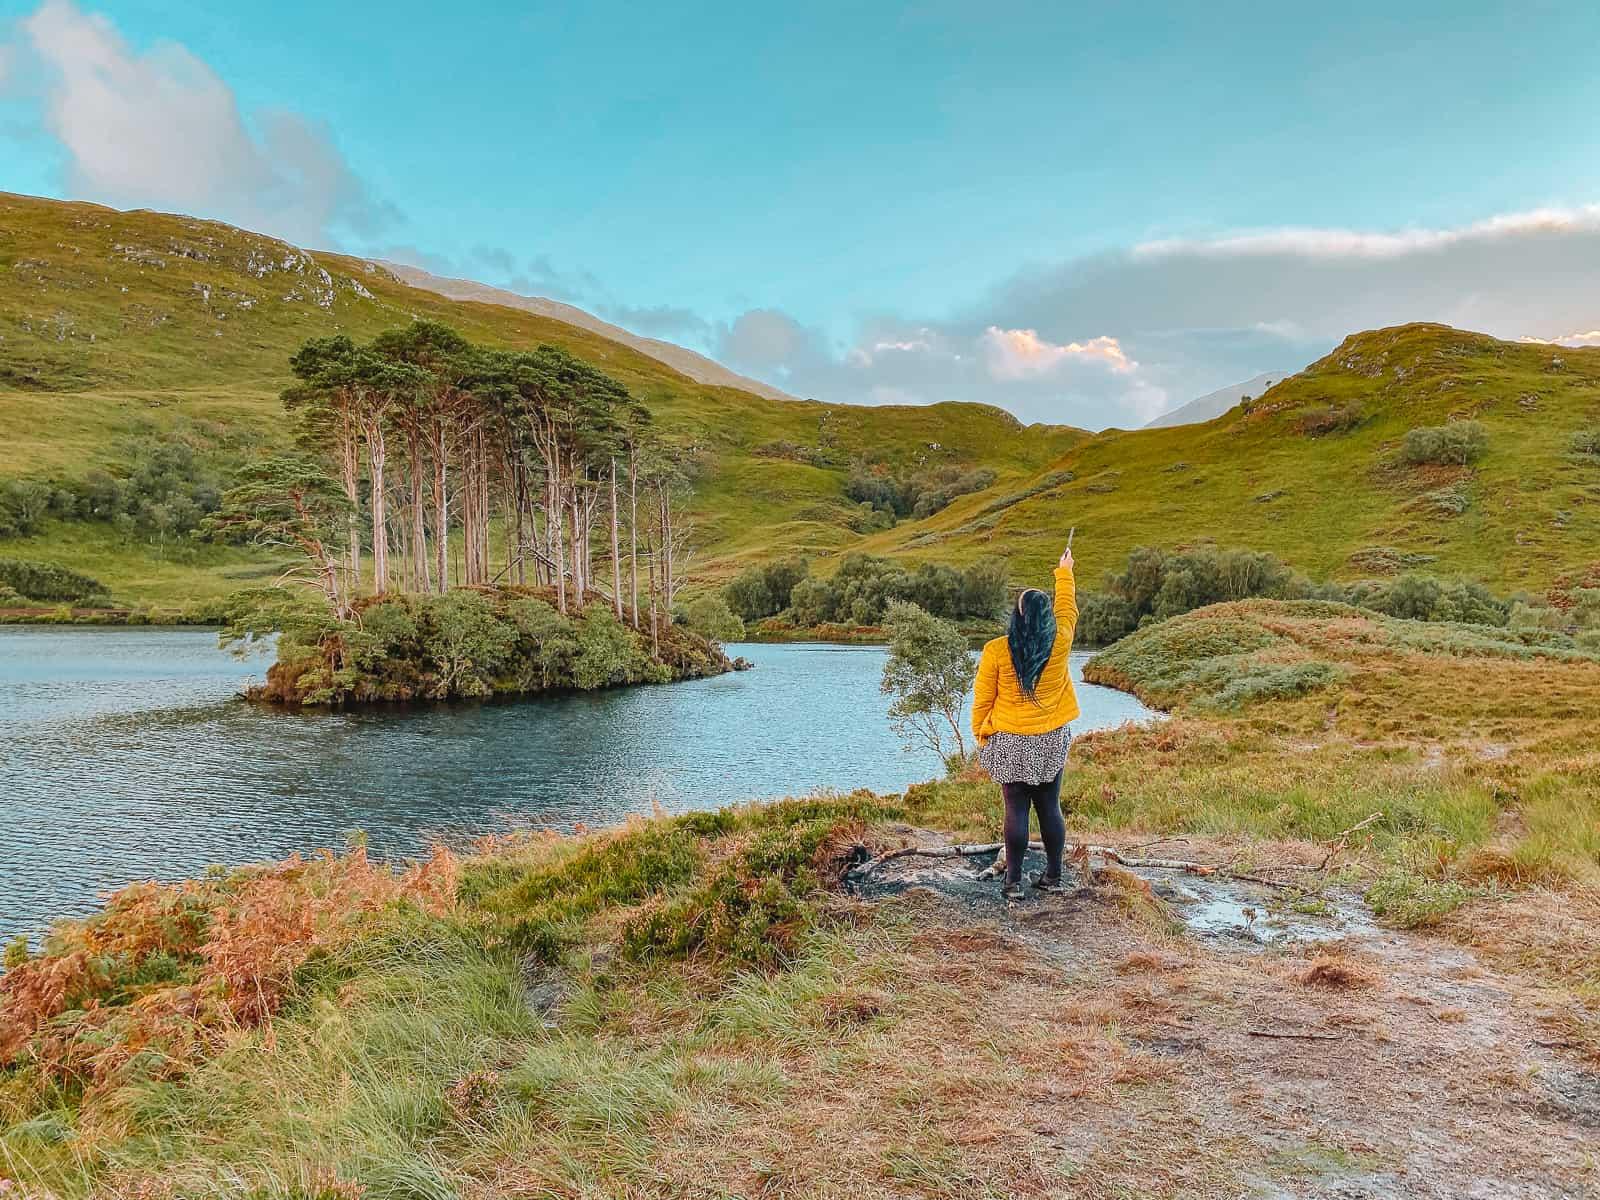 Where is Dumbledore buried? Eilean Na Moine Scotland Loch Eilt Harry Potter